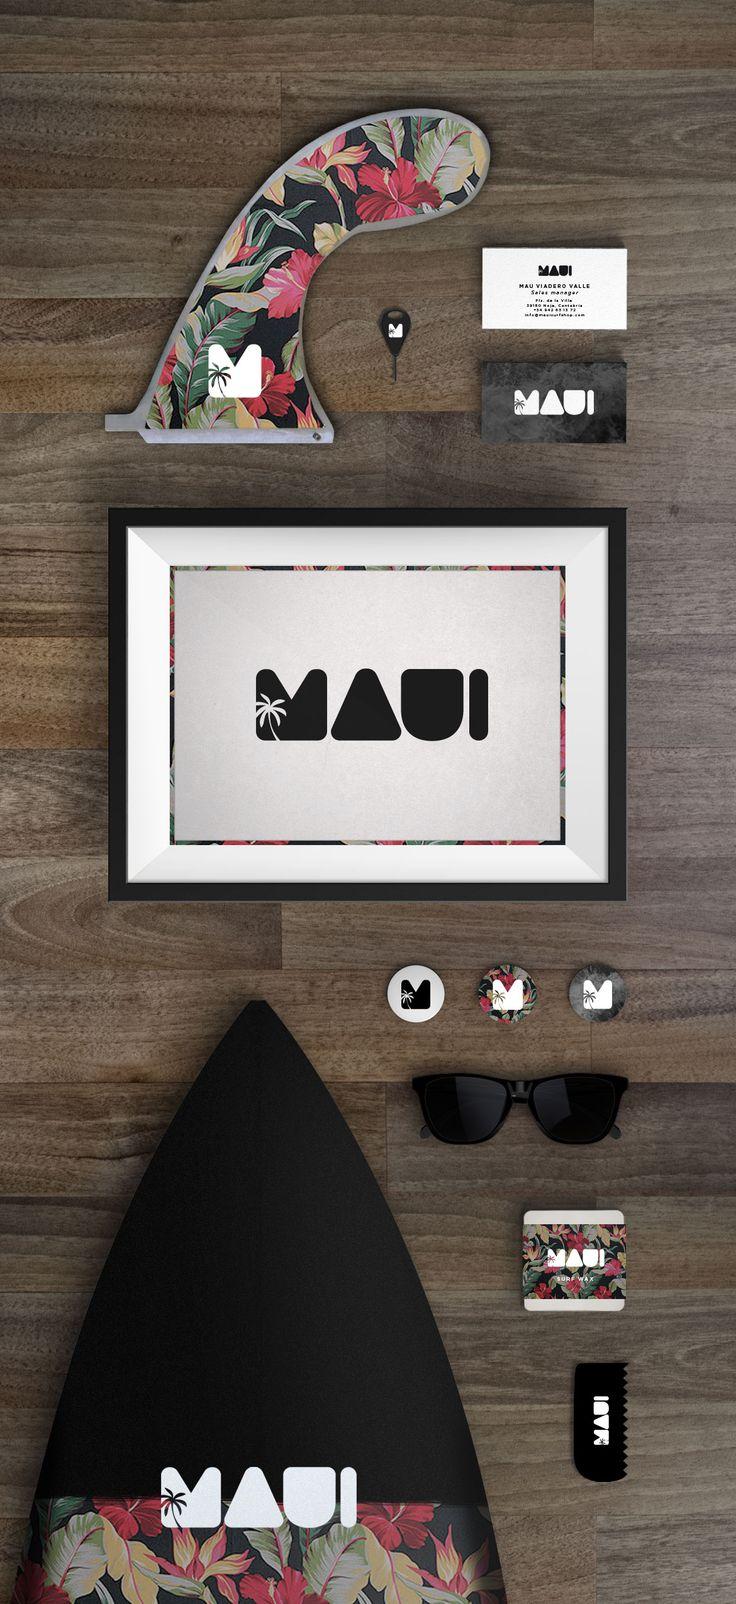 Maui Surf Shop Branding by Blanco Mate Studio | Fivestar Branding – Design and Branding Agency & Inspiration Gallery